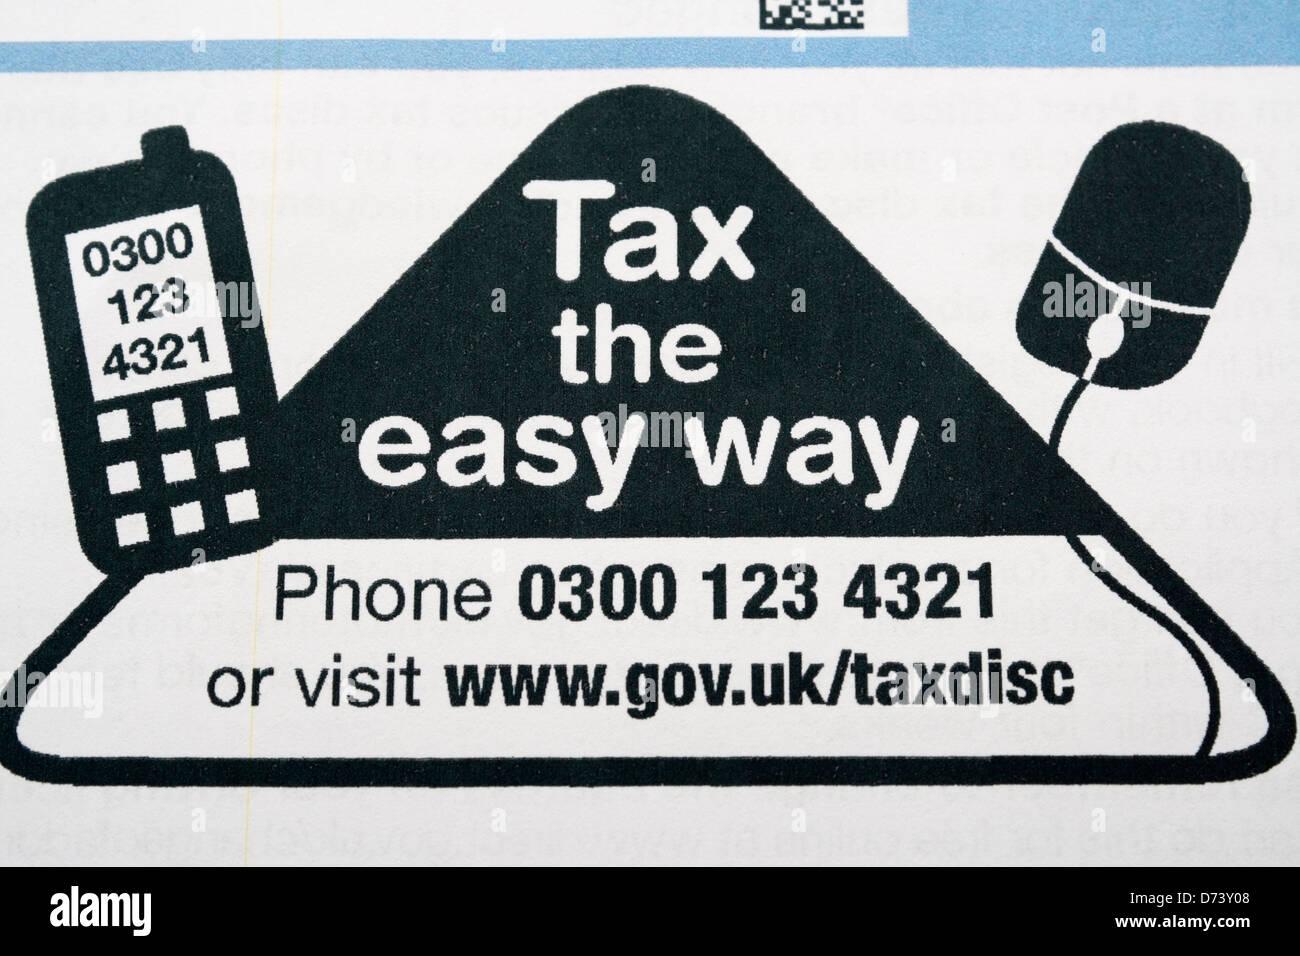 UK car tax renewal form - Stock Image